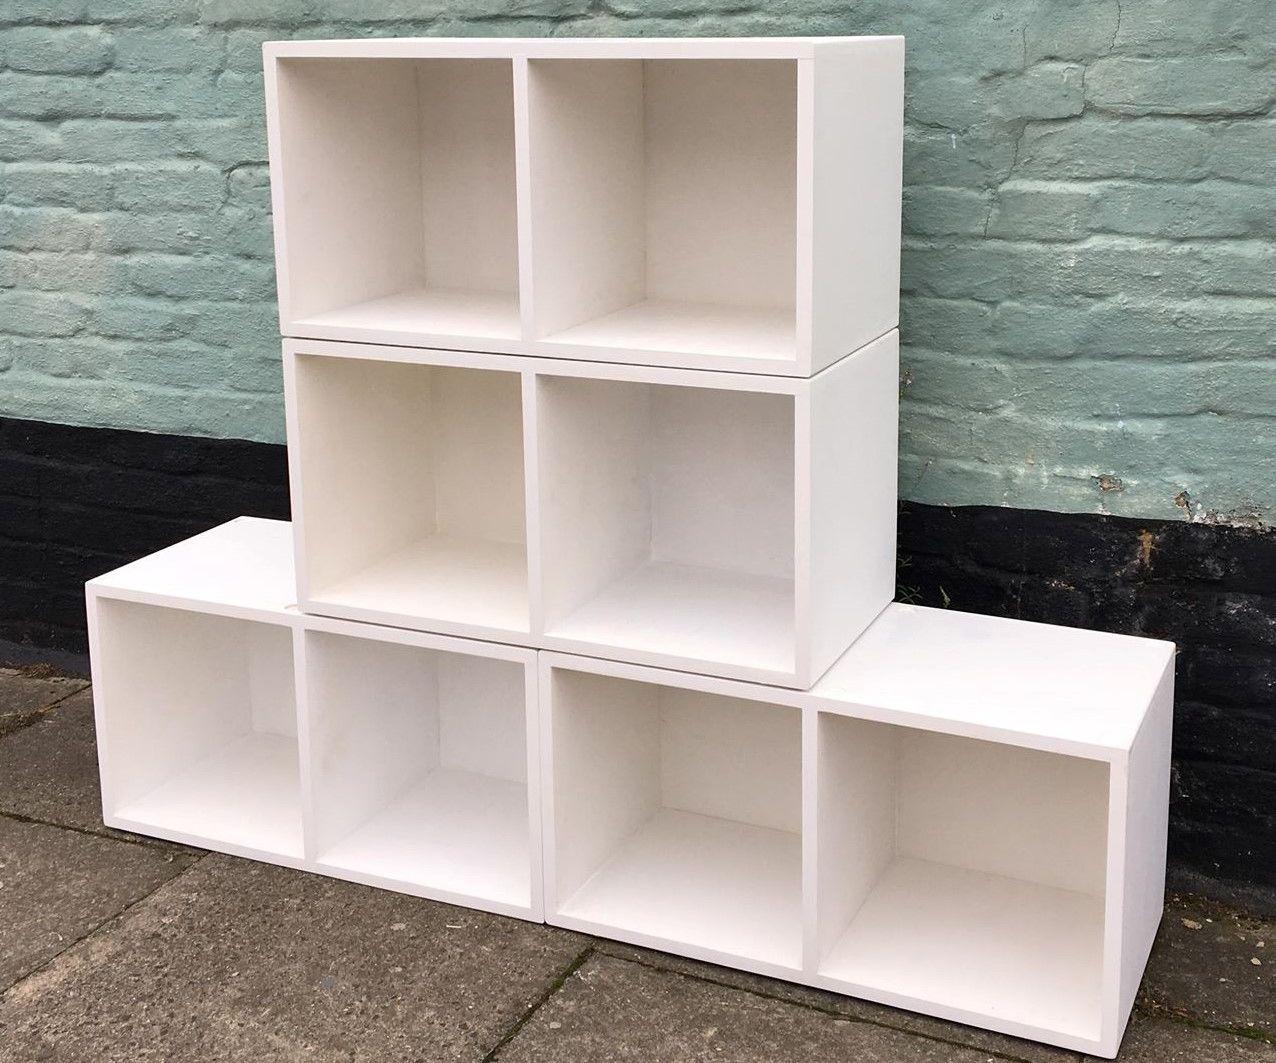 Modular Record Storage Units